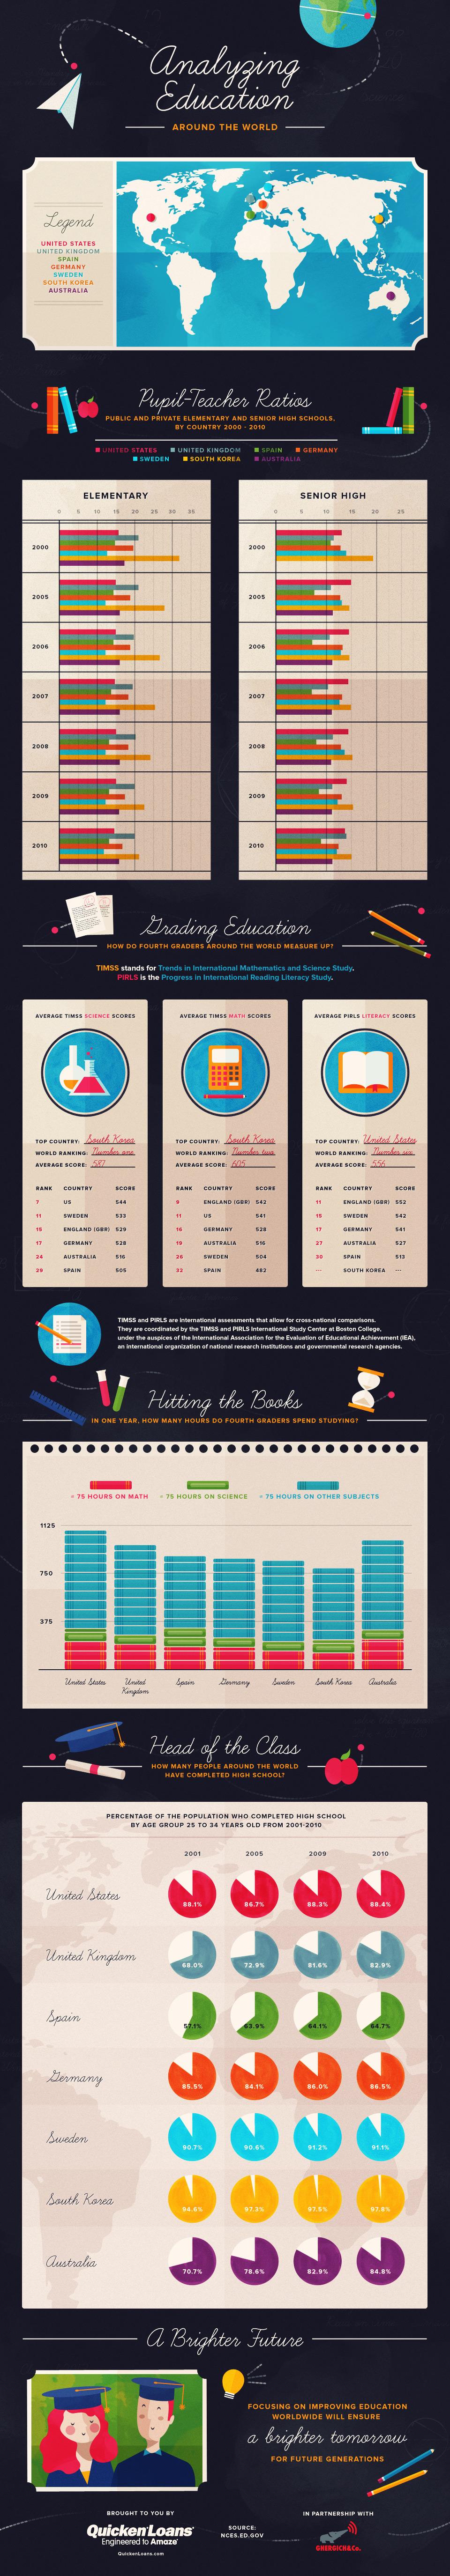 Analyzing Education